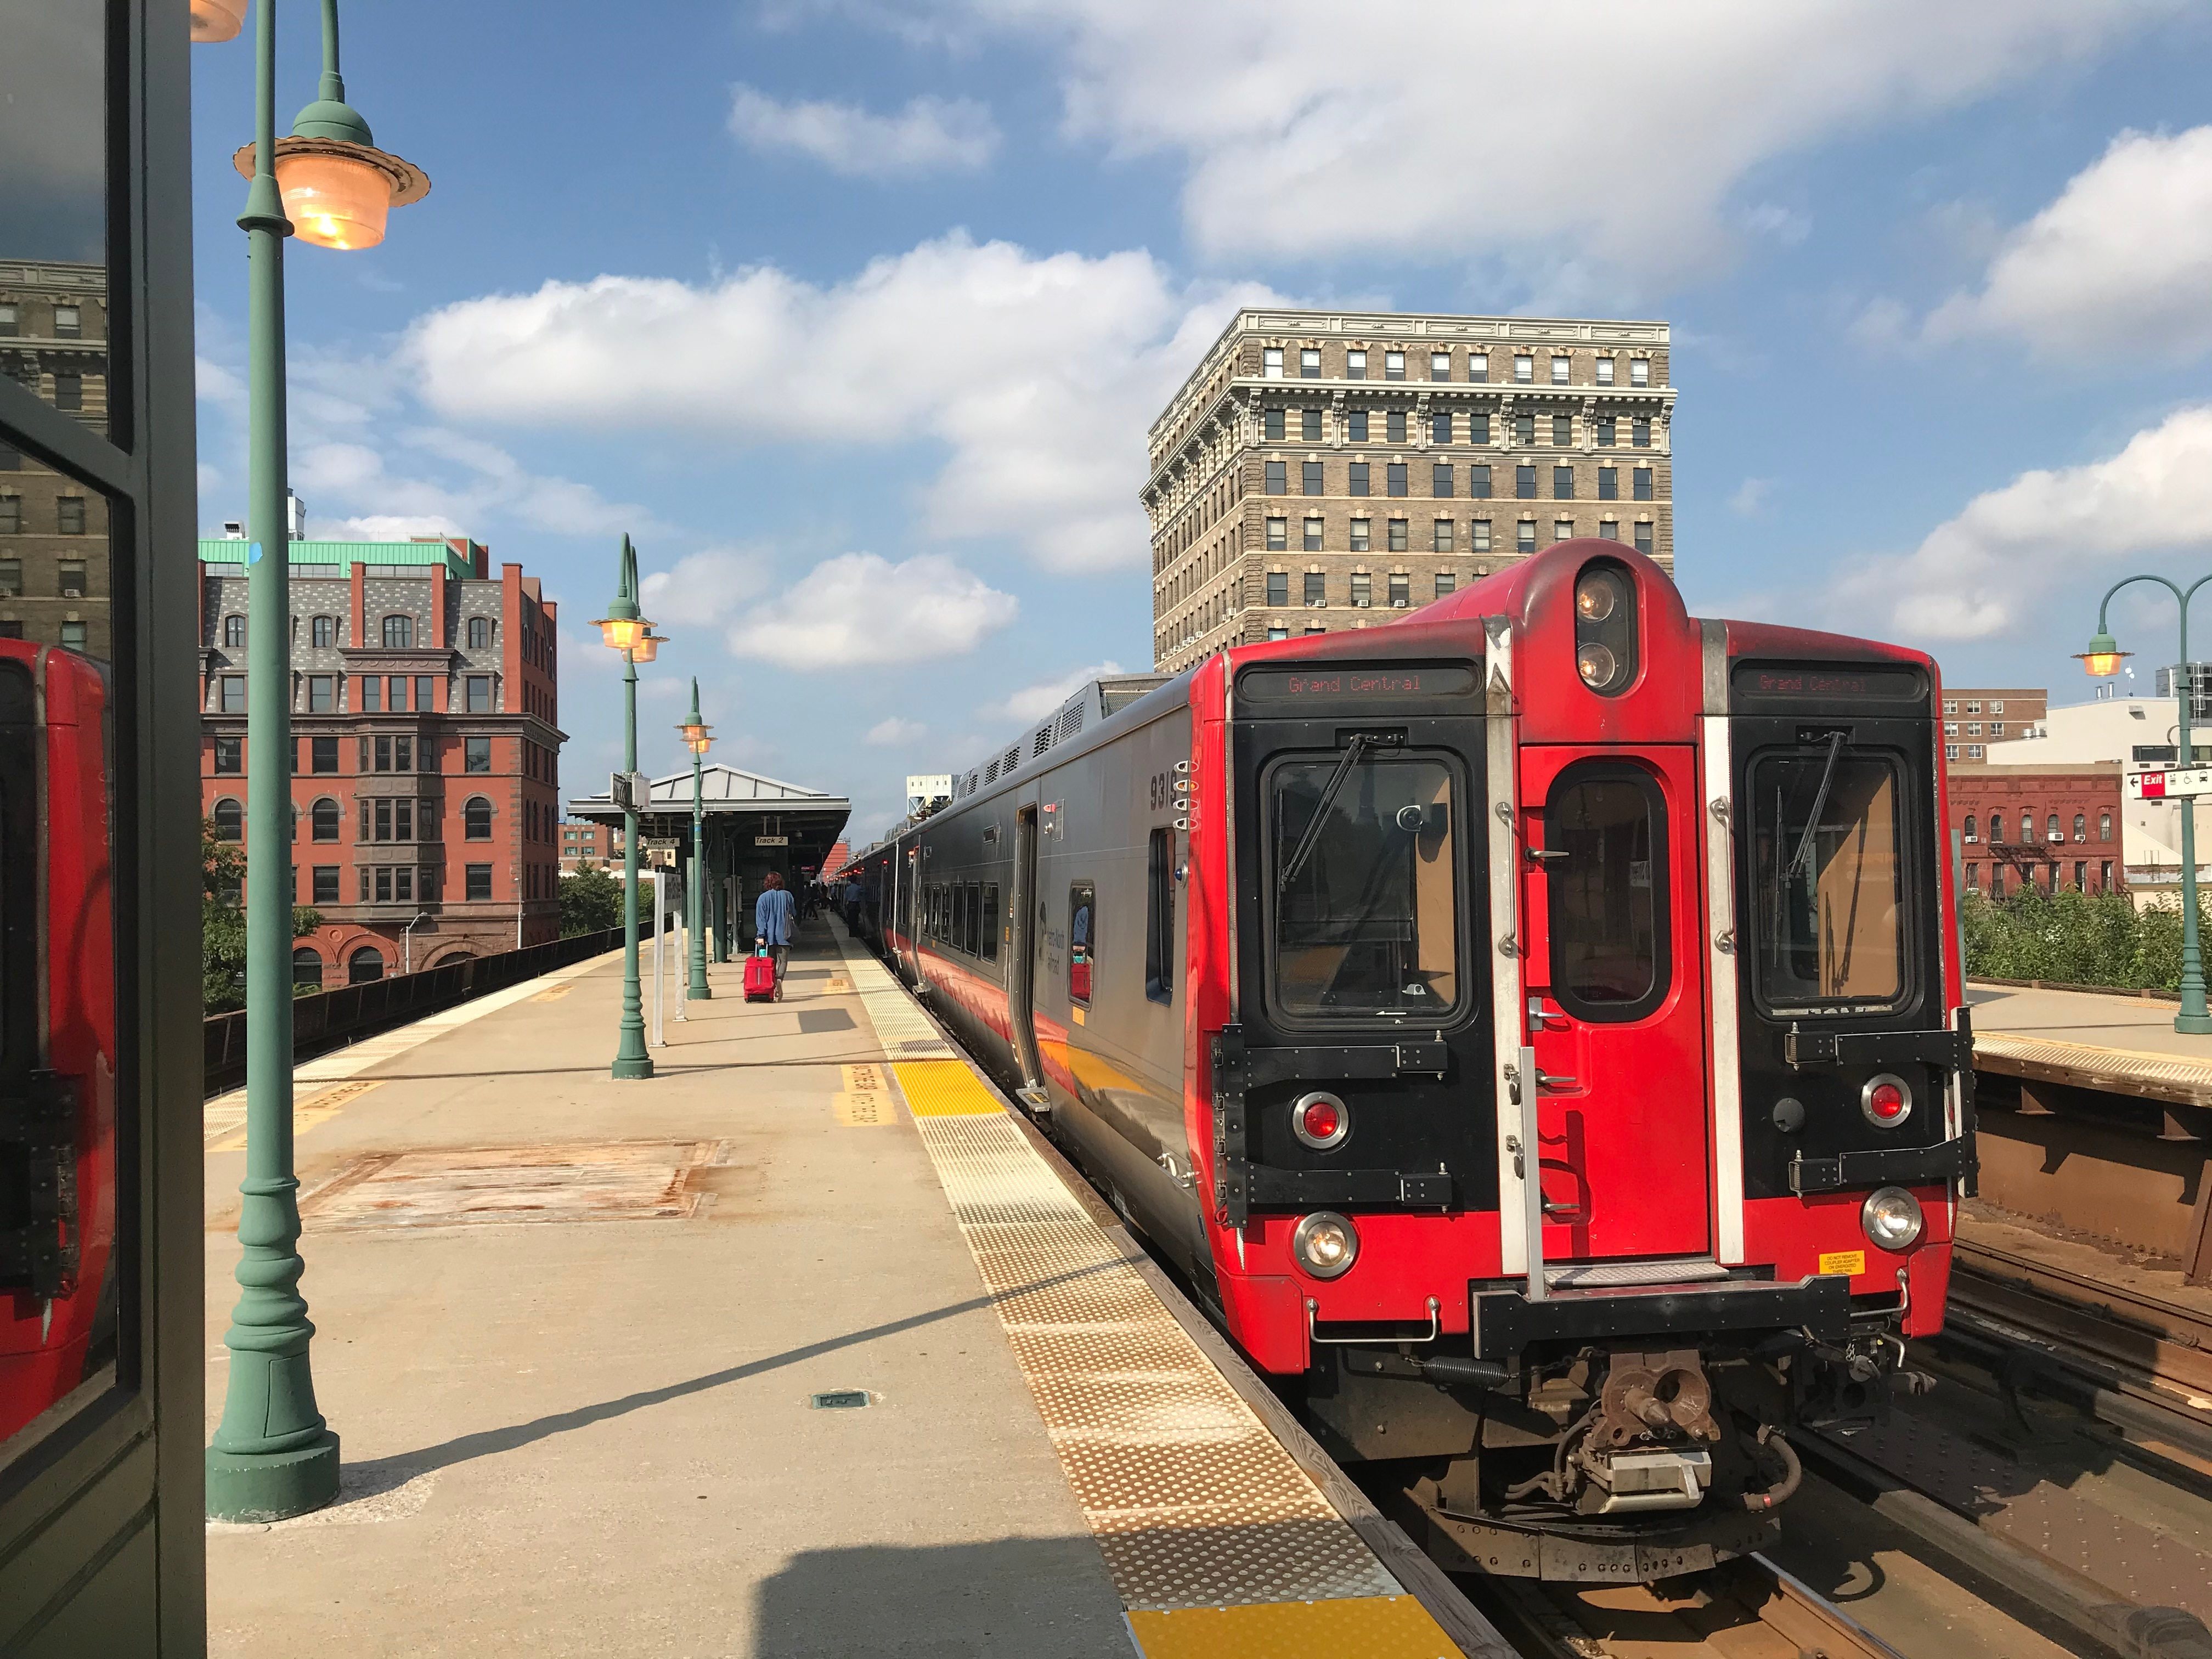 Metro-North Train at 125th street NH line